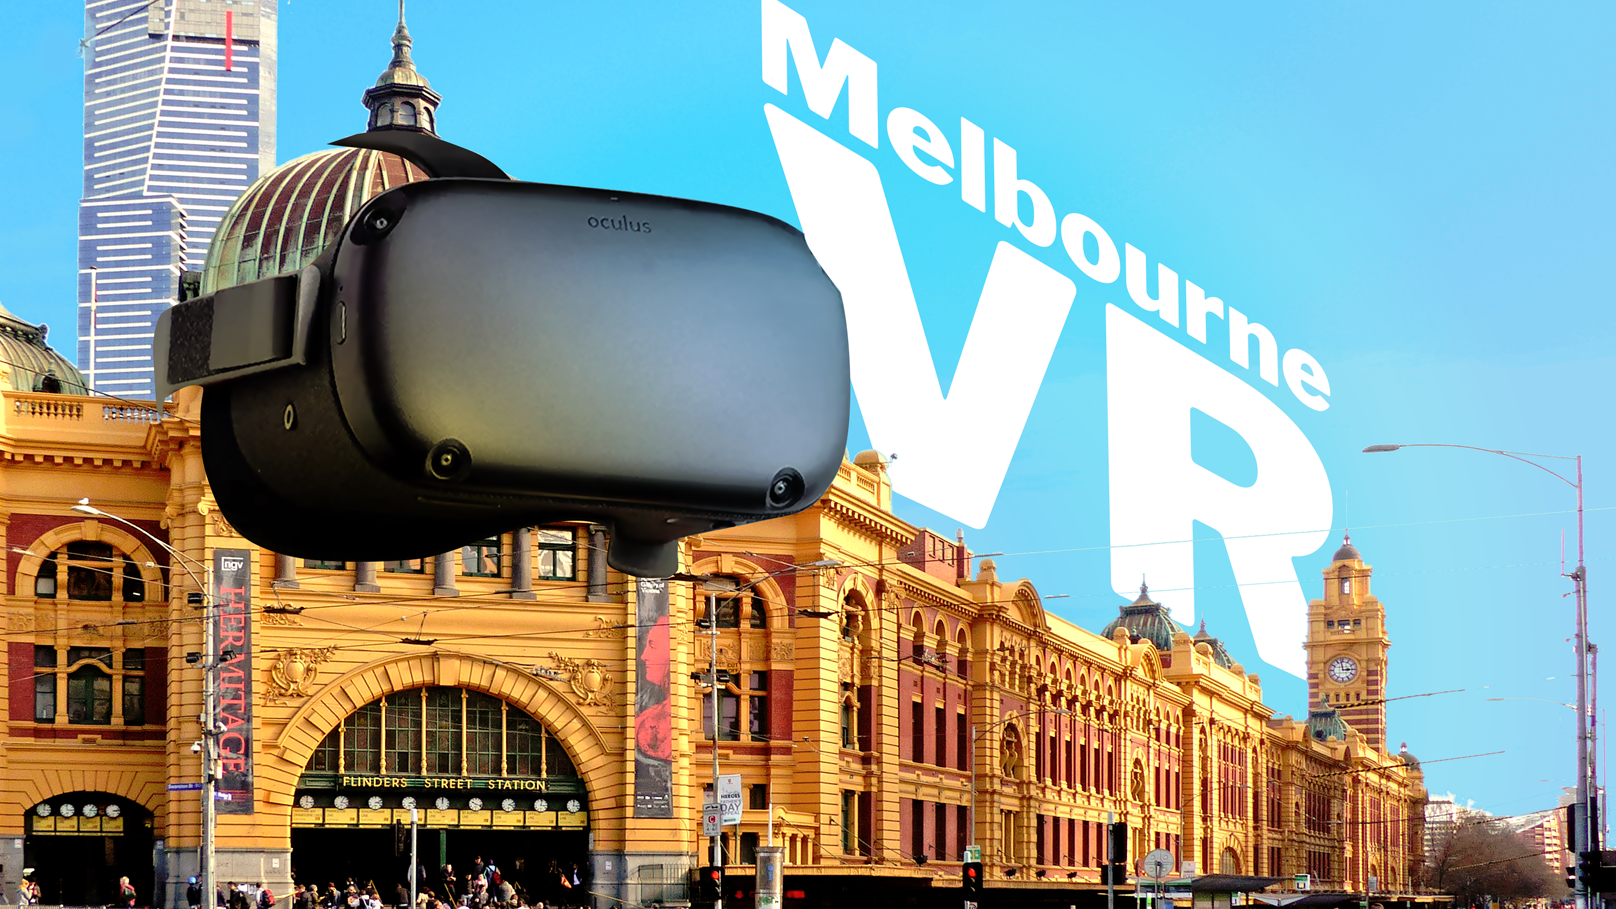 Melbourne VR Community